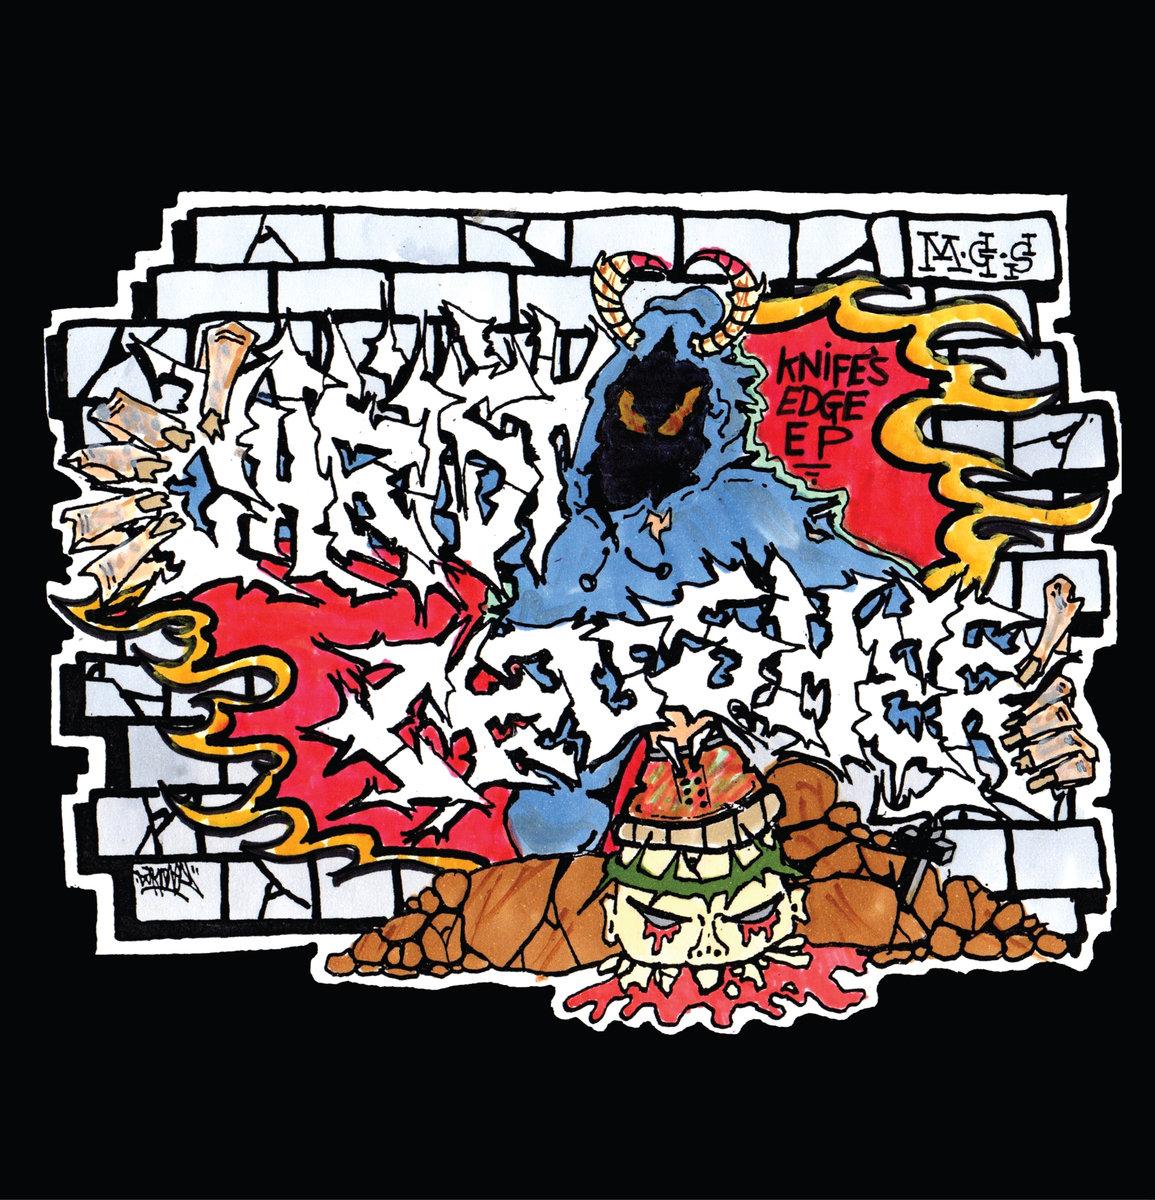 CHRIST CRUSHER - KNIFE'S EDGE EP 7